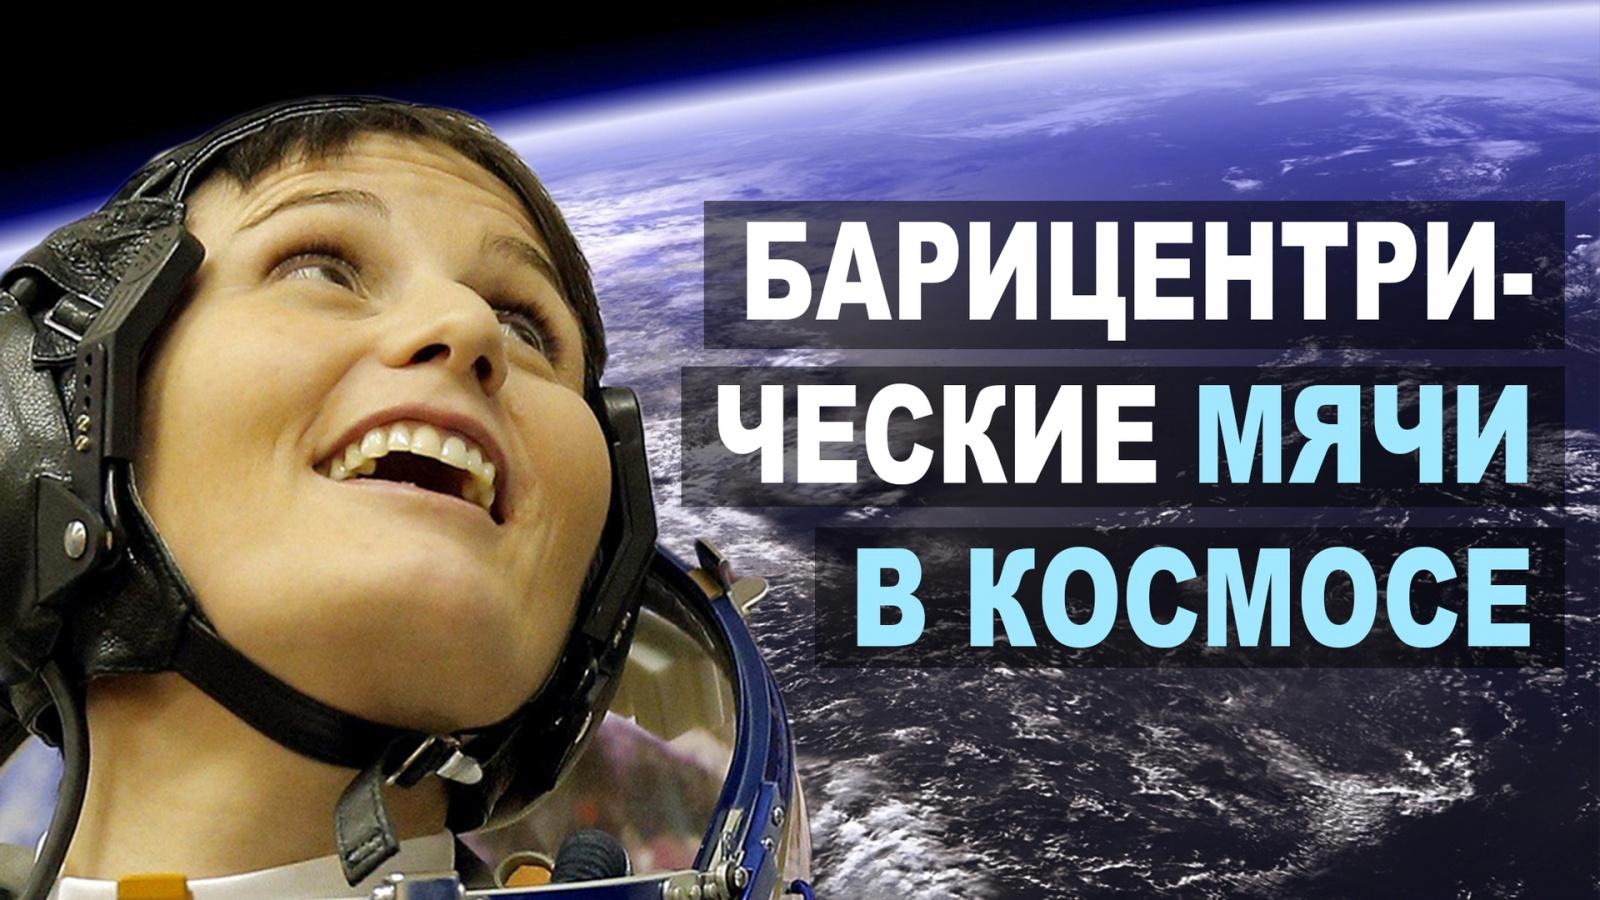 Саманта Кристофоретти: Барицентрические мячи в космосе [Озвучка Vert Dider] - 1